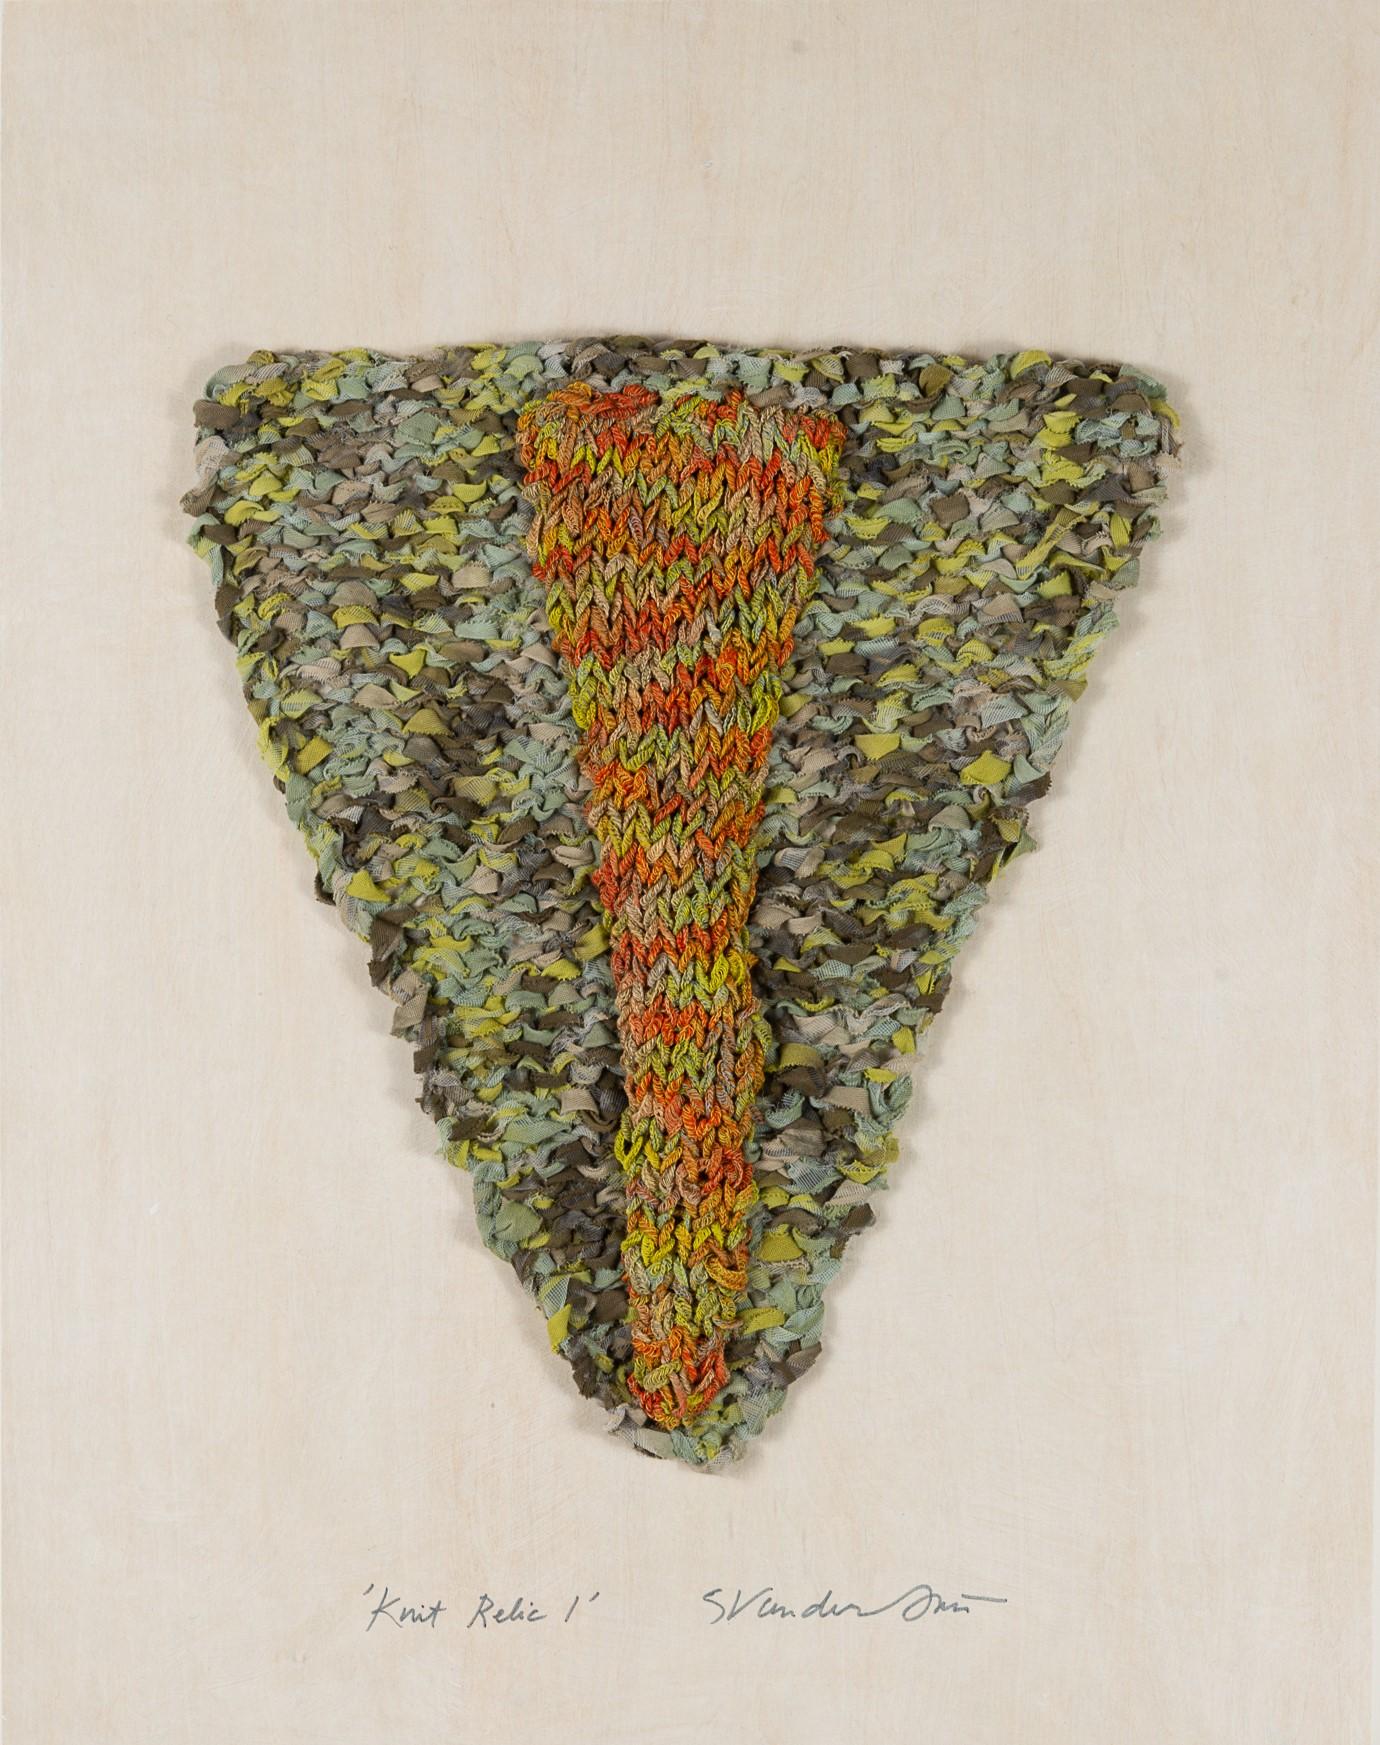 Sylvia Vander Sluis,  Knit Relic 1 (Green/Orange) , Handknit cotton/polyester, ribbon yarn, 18x14x1.5